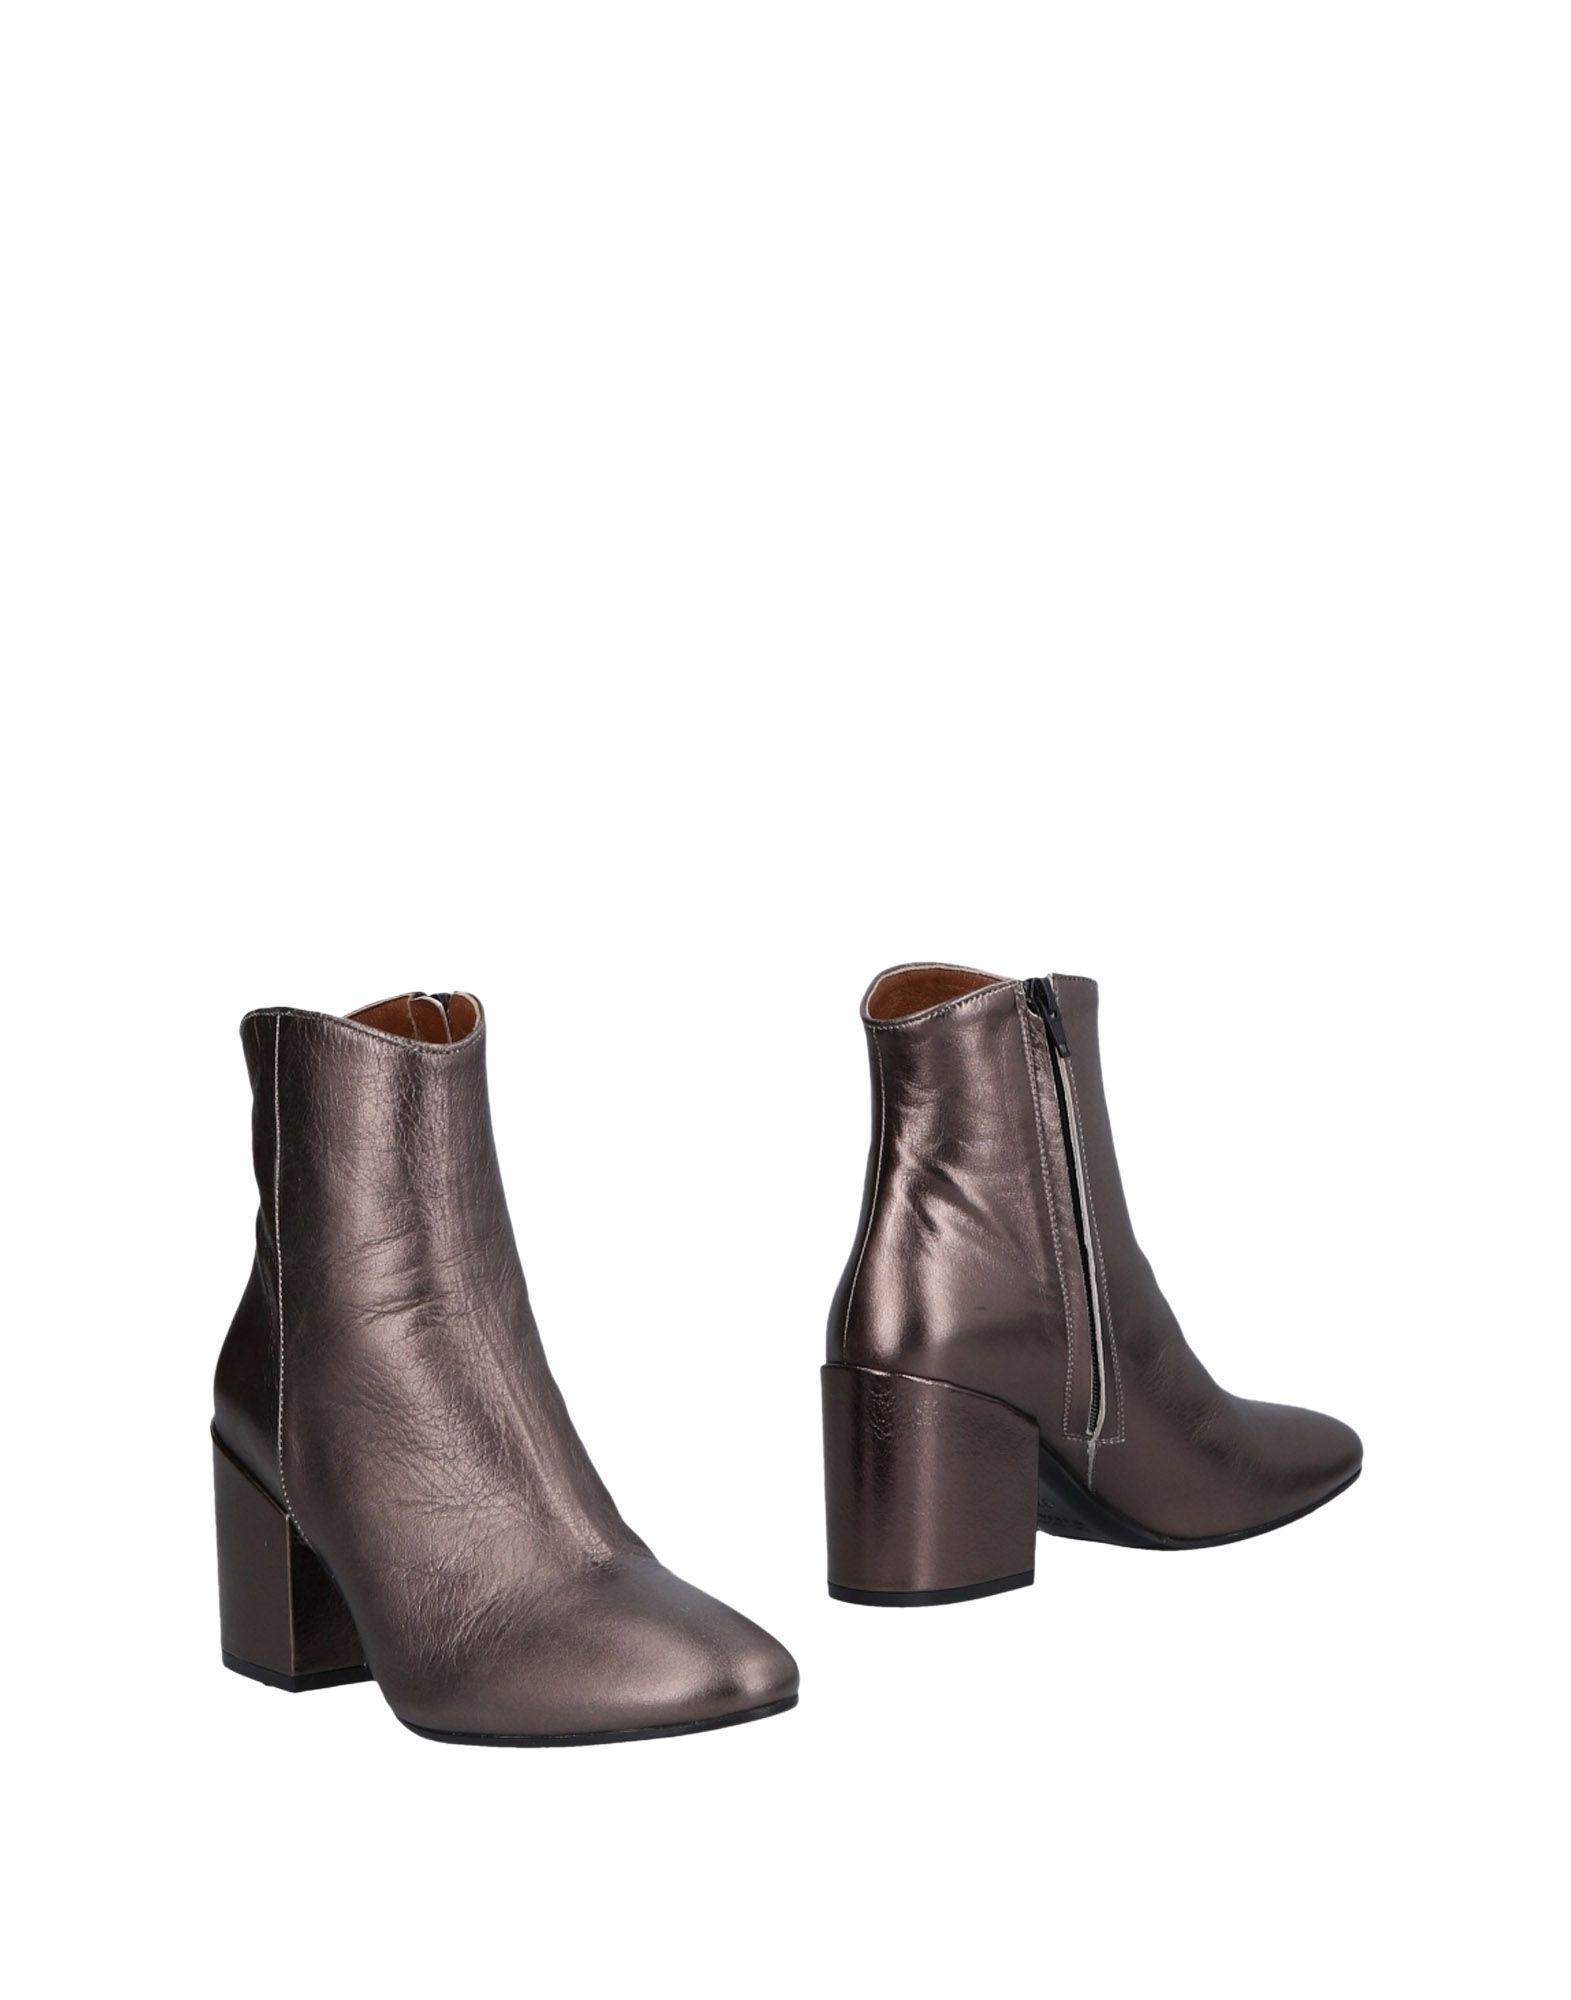 MARC ELLIS Полусапоги и высокие ботинки marc ellis полусапоги и высокие ботинки